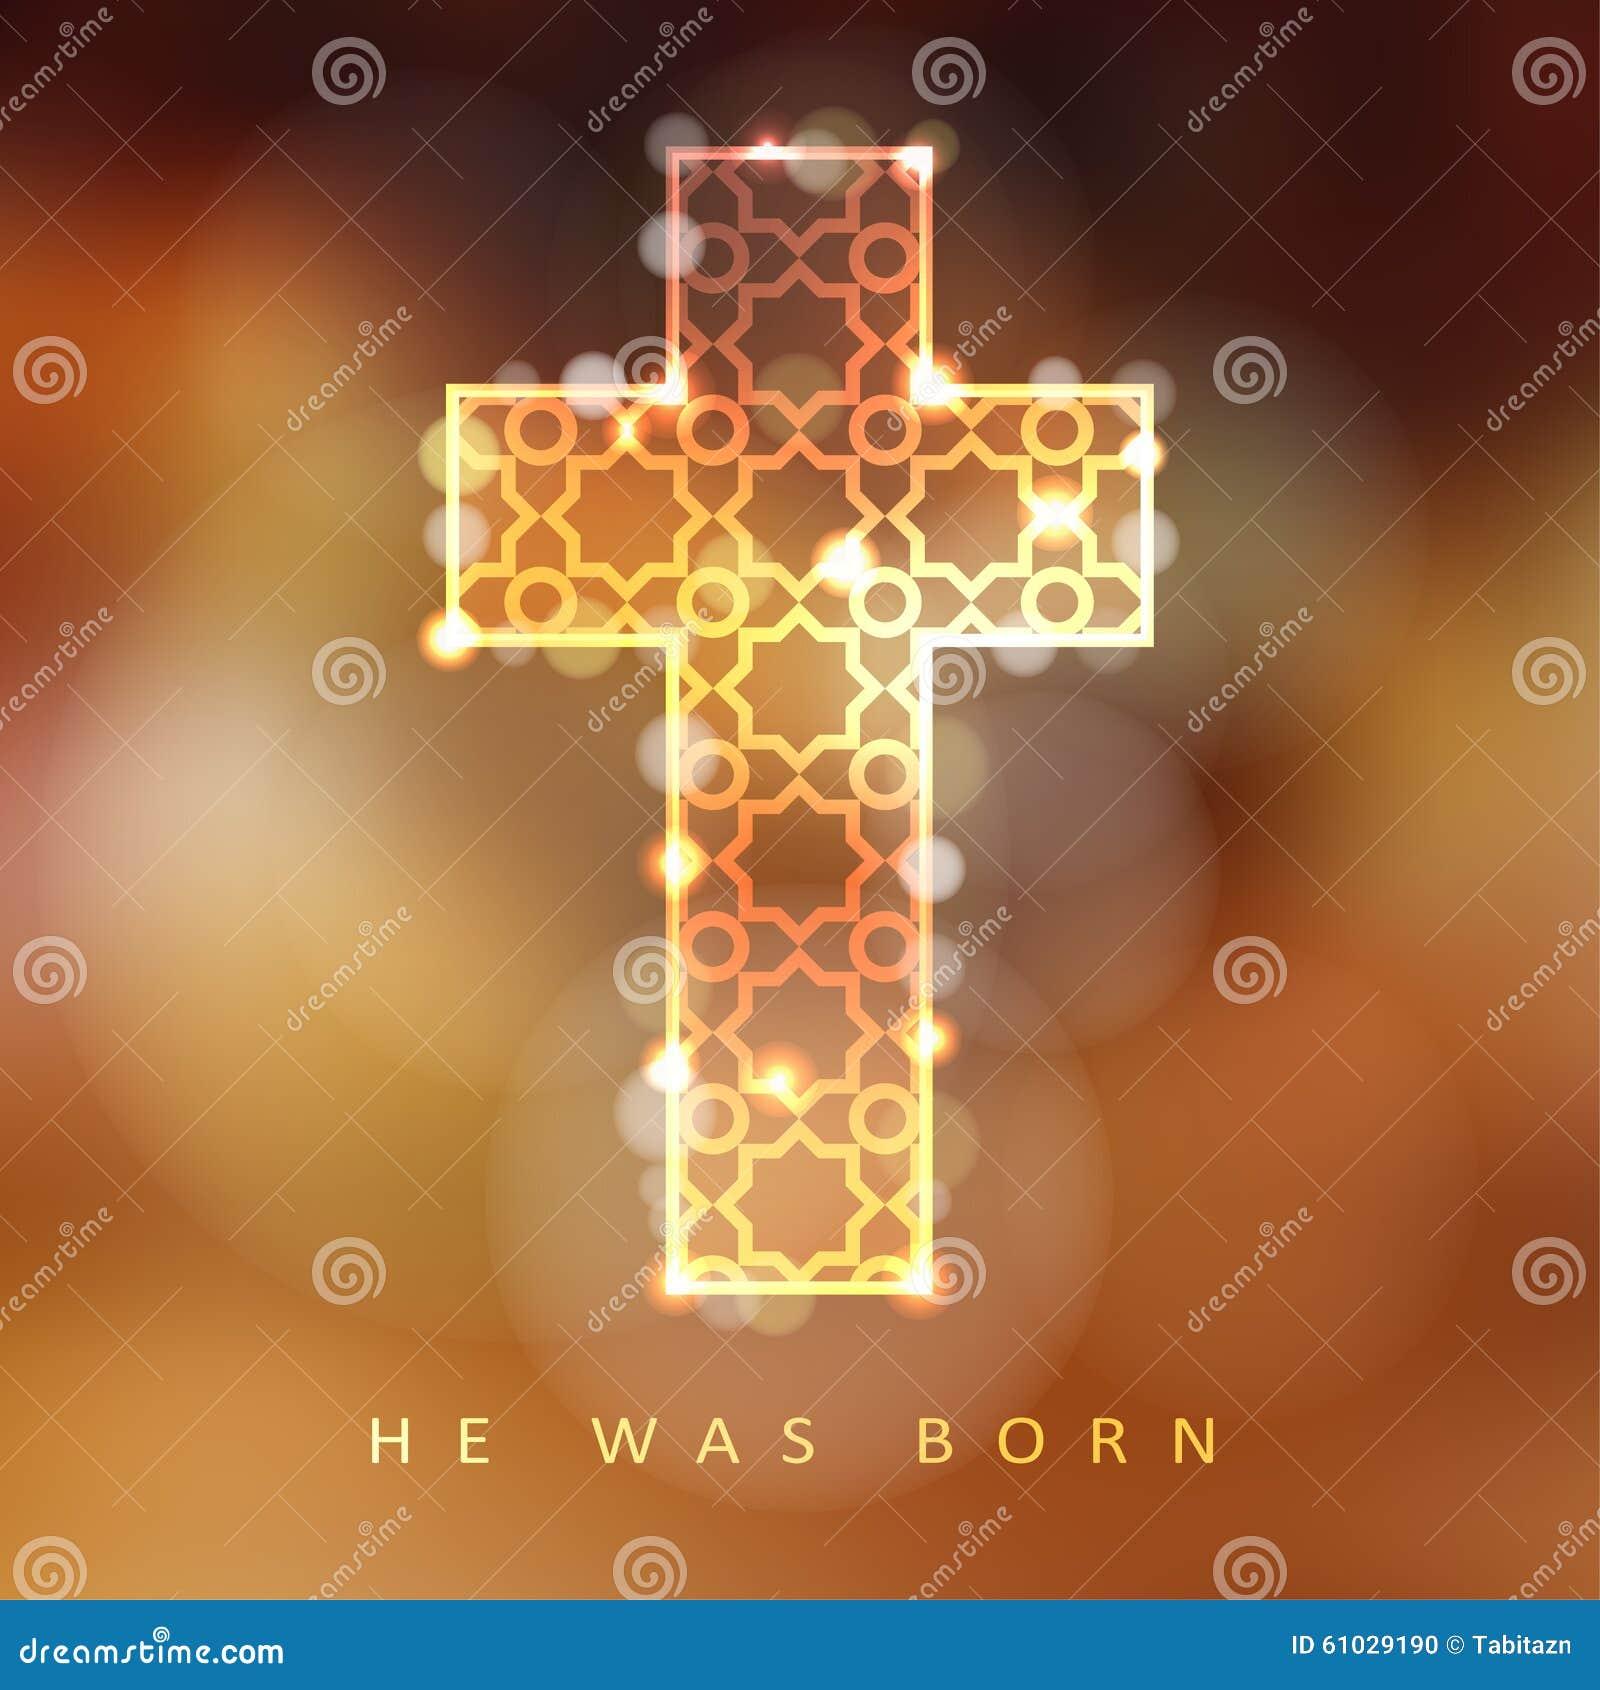 Christmas Room Stock Vector Image Of Illuminated: Christmas Background With Illuminated Ornamental Cross